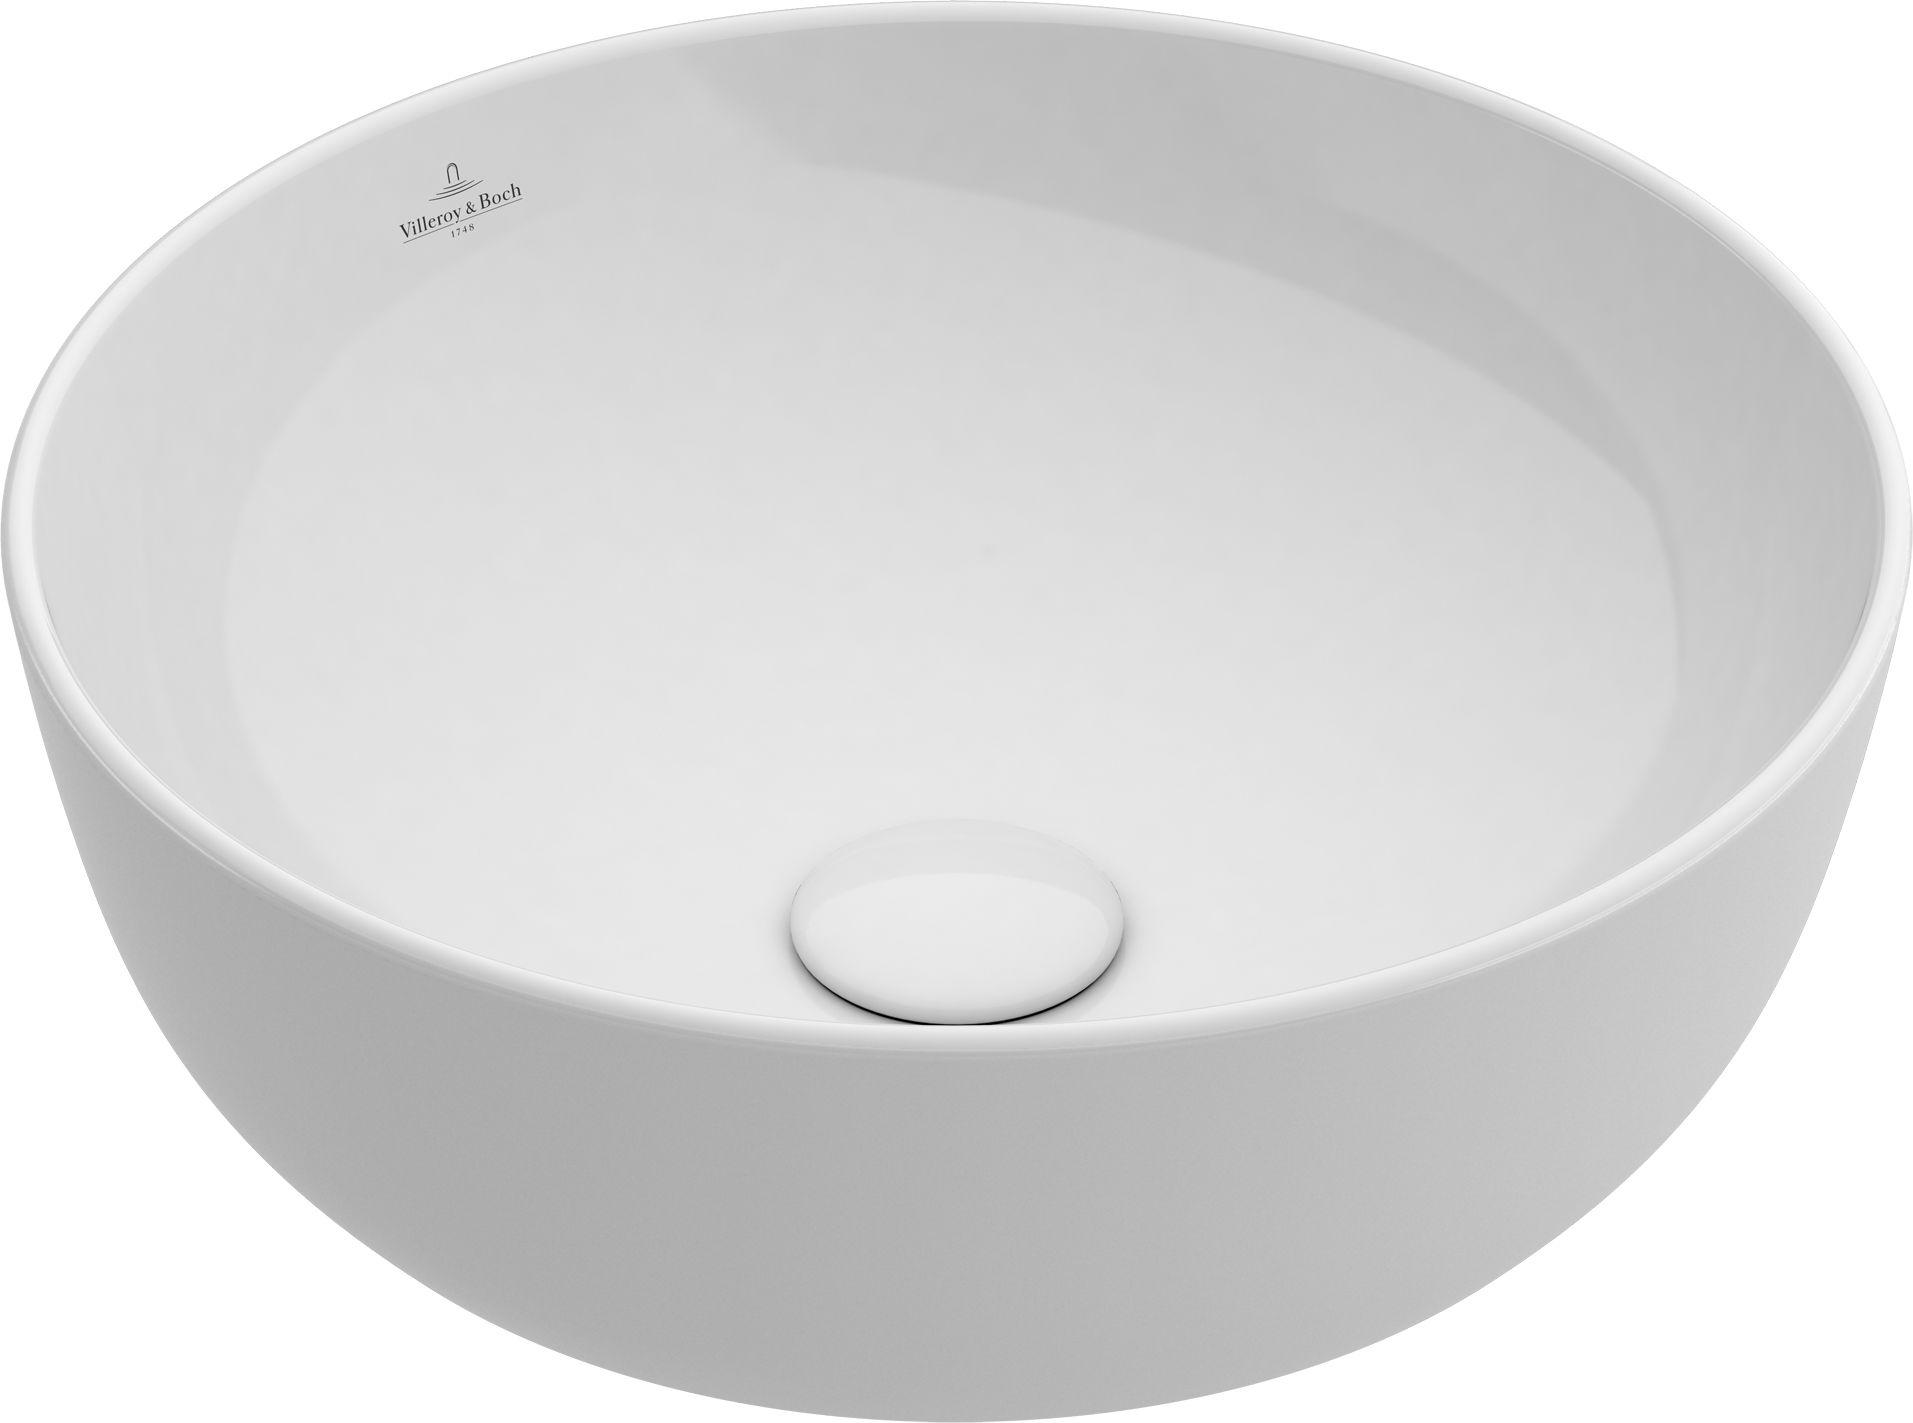 Villeroy & Boch Artis 43 cm CeramicPlus washbasin (417943R1) Izlietne